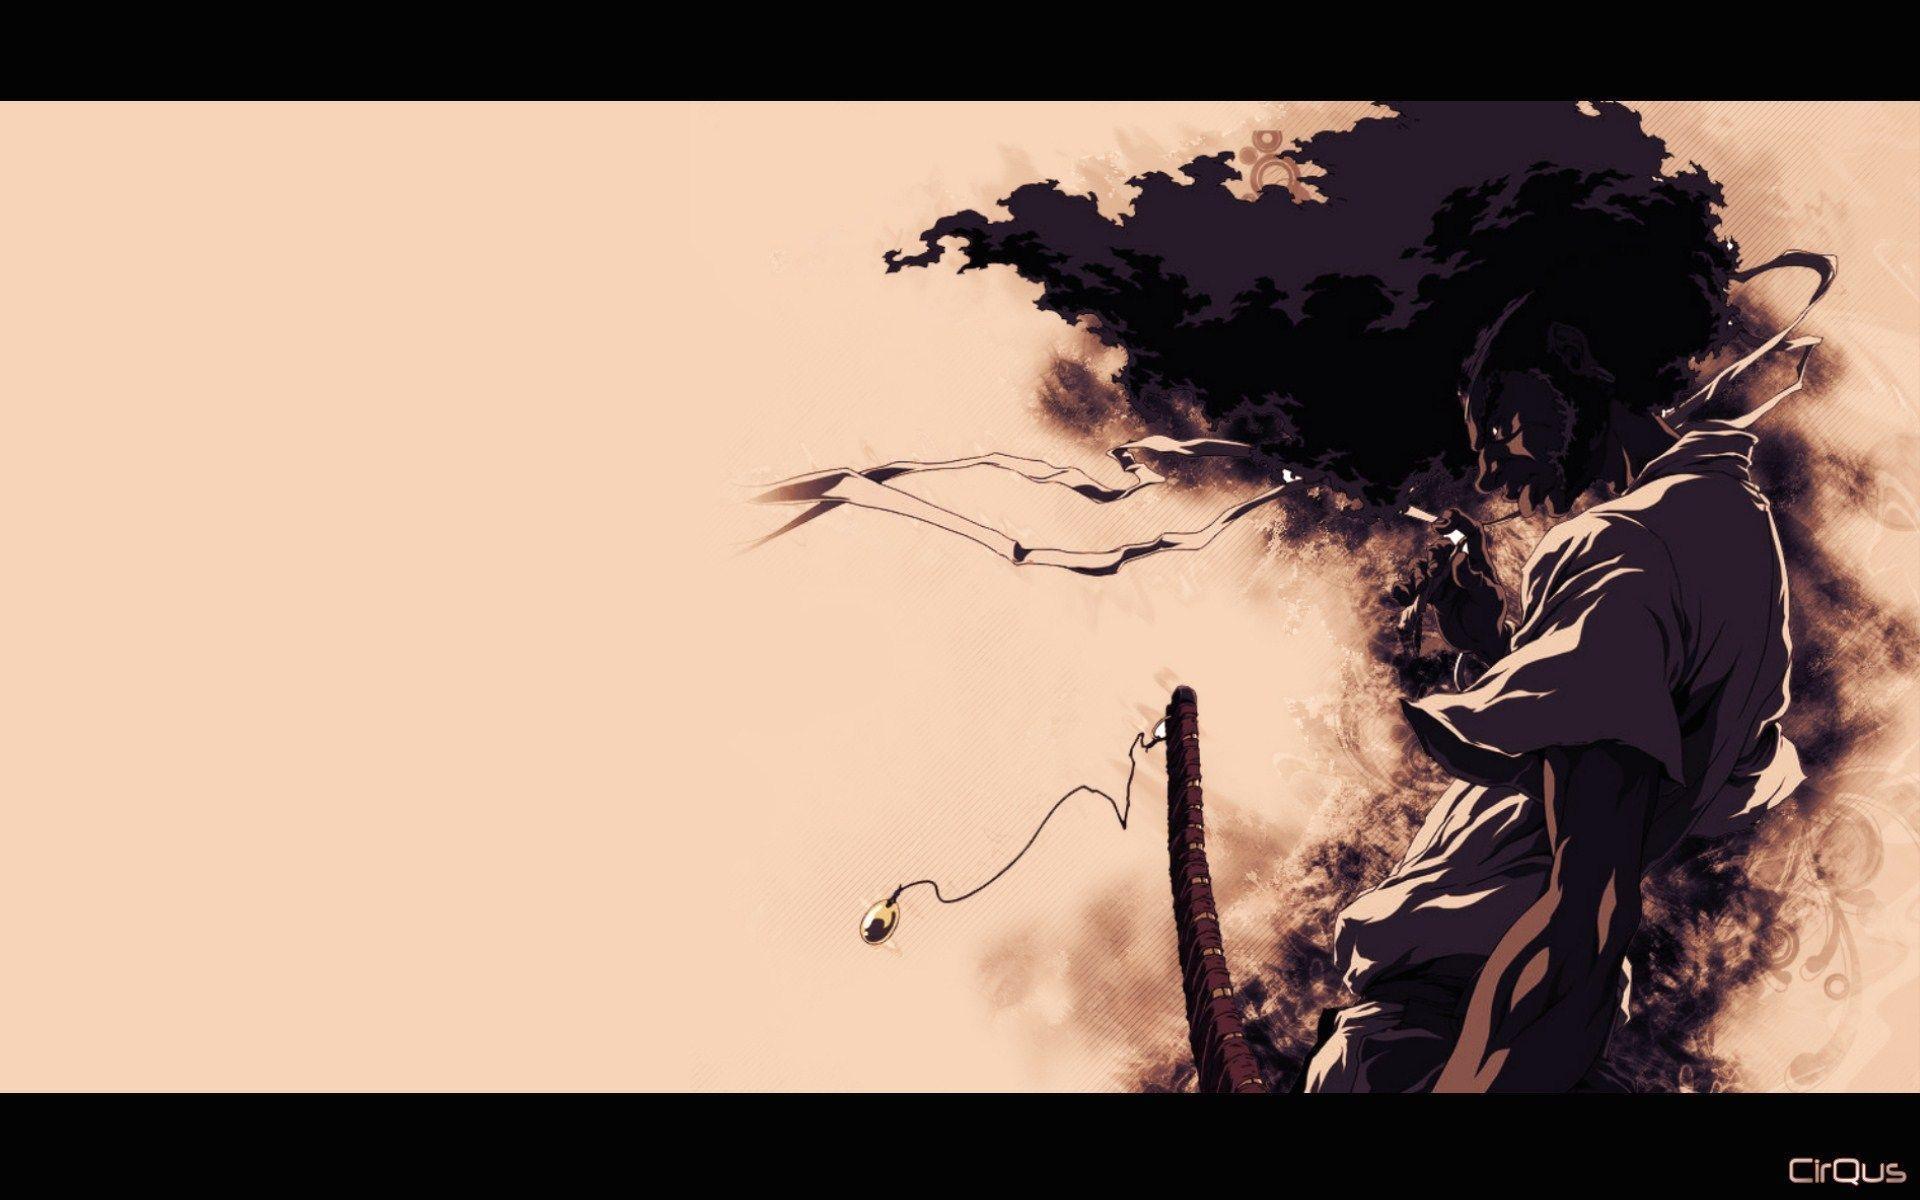 30 samurai wallpapers hd - photo #19